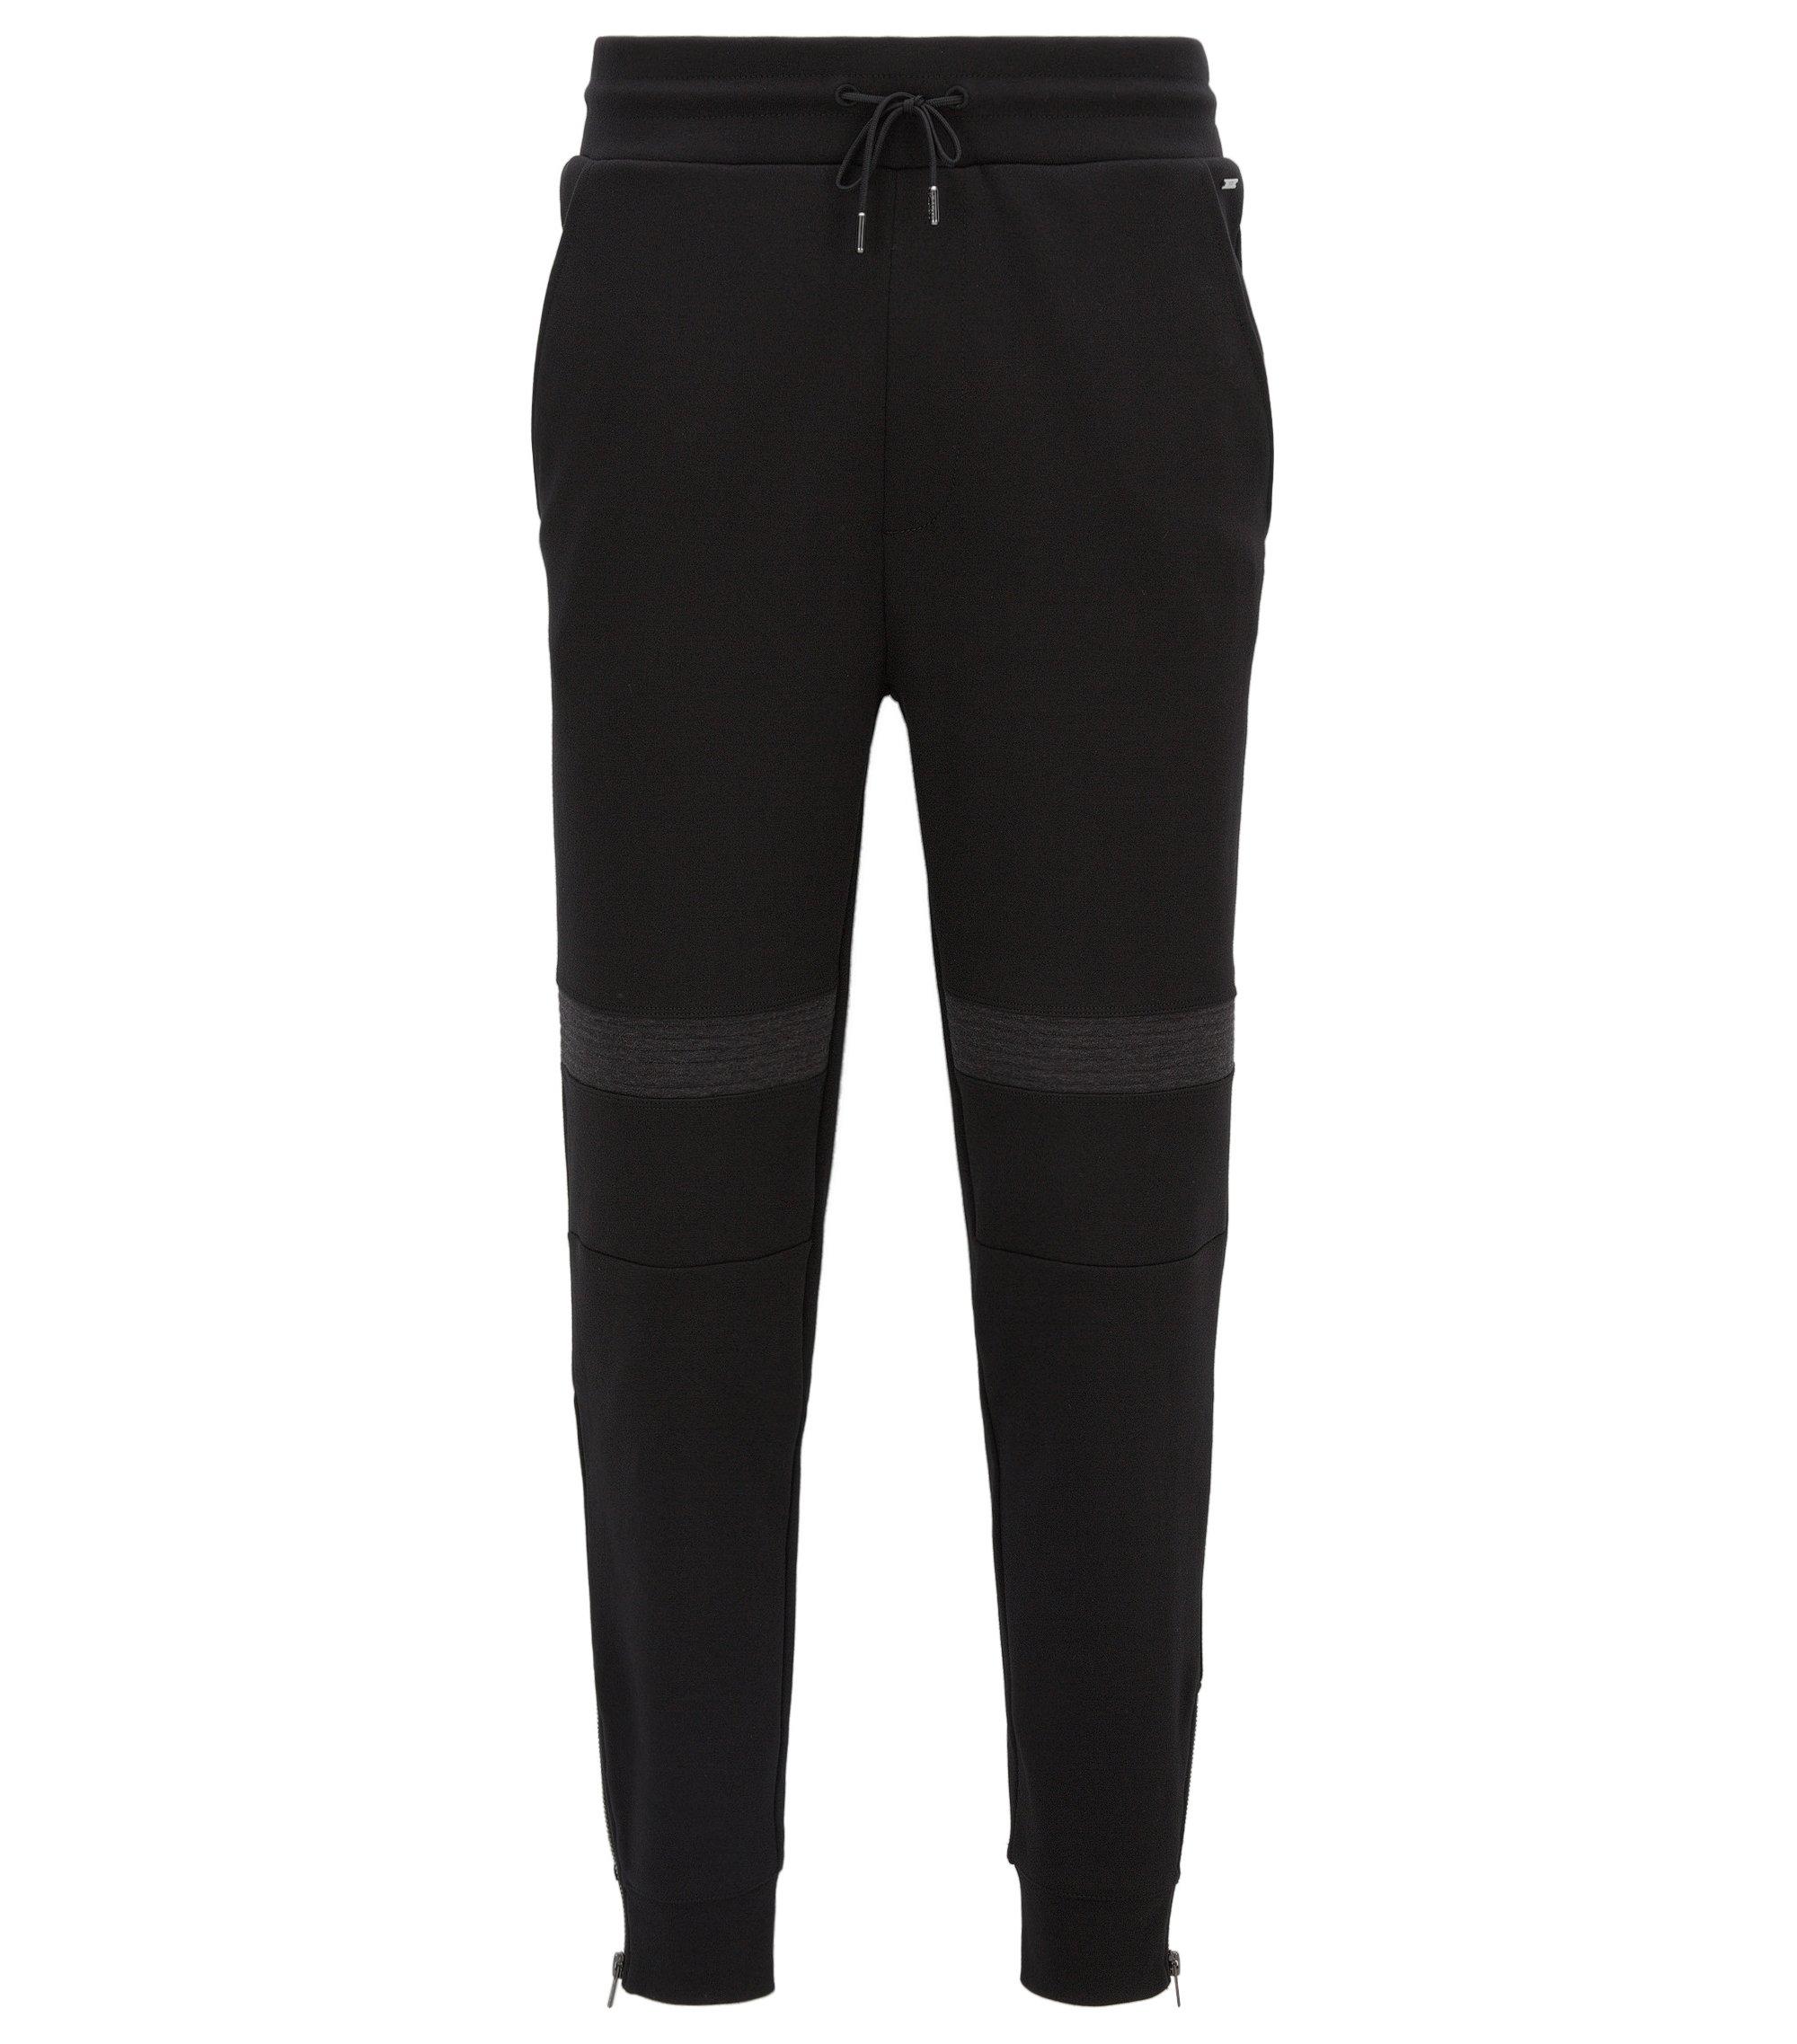 Pantalon Relaxed Fit en coton interlock lourd, Noir